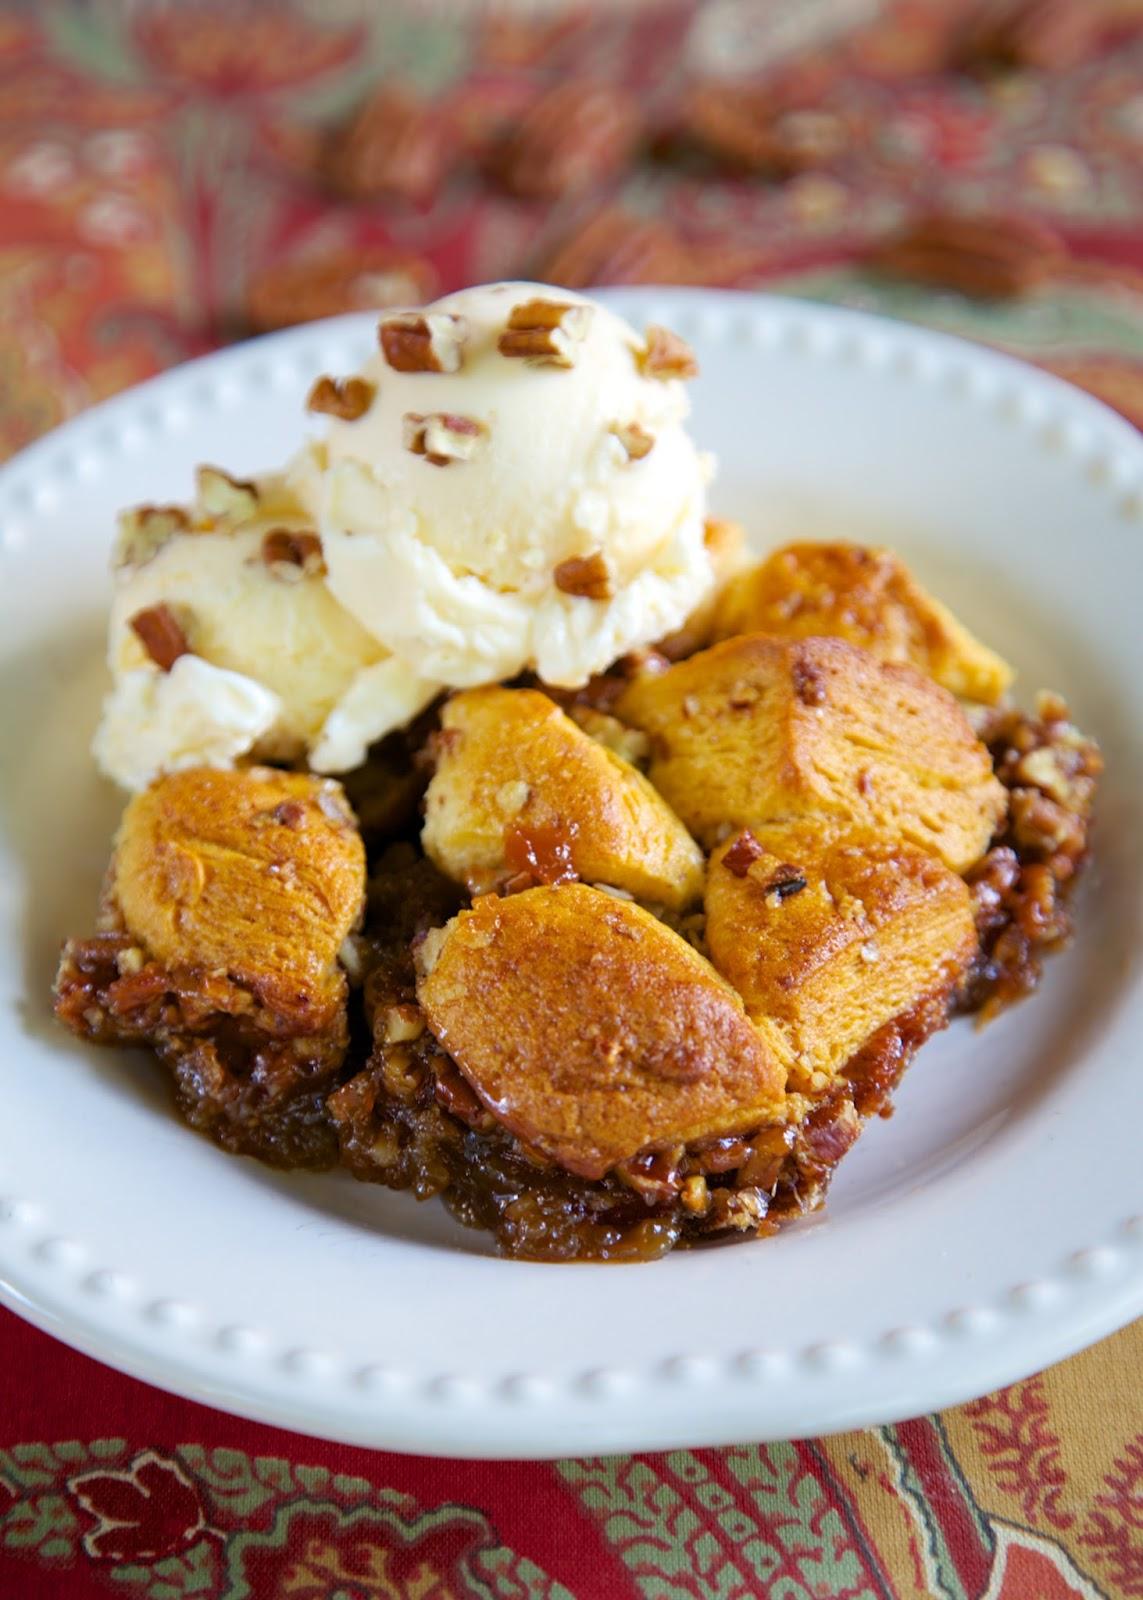 Pecan Pie Bubble Up - pecan pie filling tossed with biscuits - crazy good!! Serve warm with vanilla ice cream!